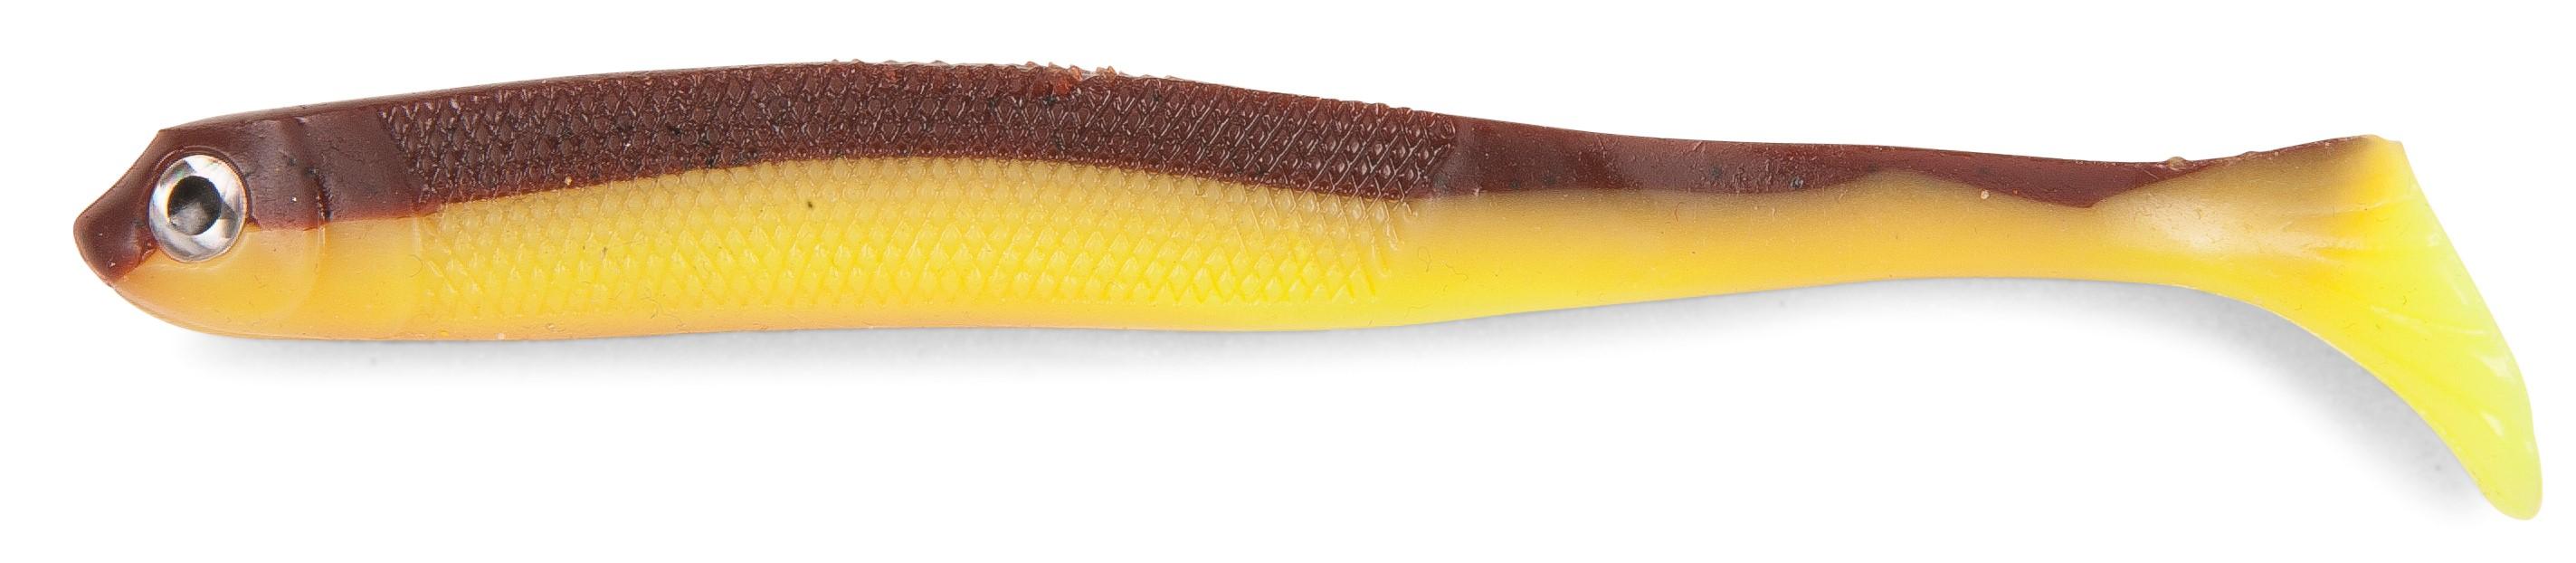 Iron Claw gumová nástraha Slim Jim 10 cm Vzor BC, 3 ks